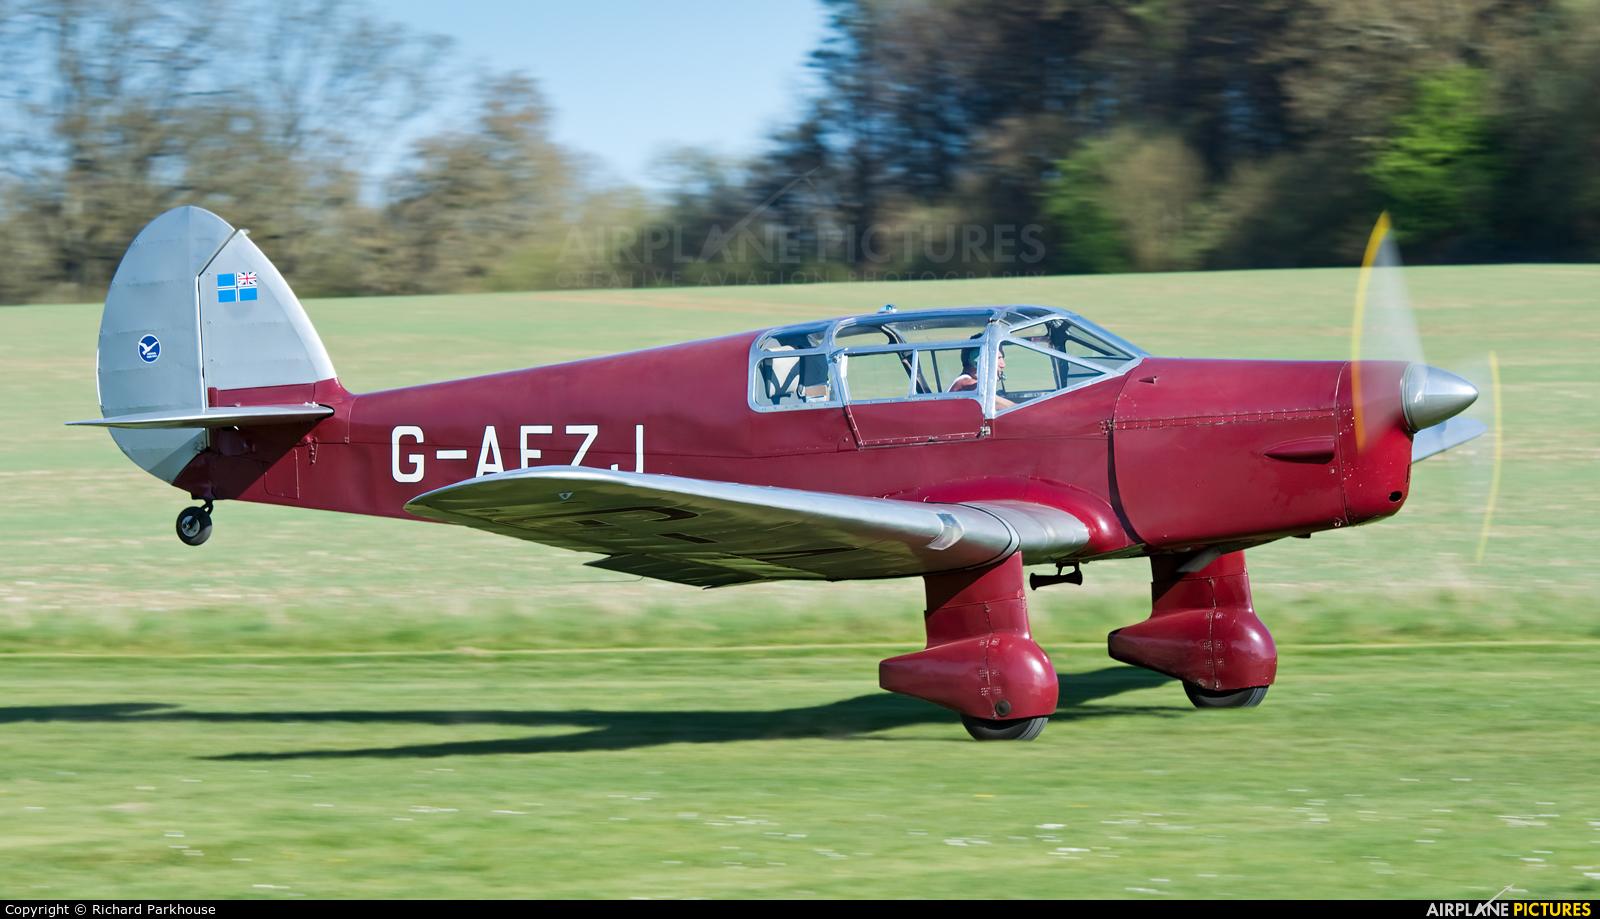 Private G-AEZJ aircraft at Popham